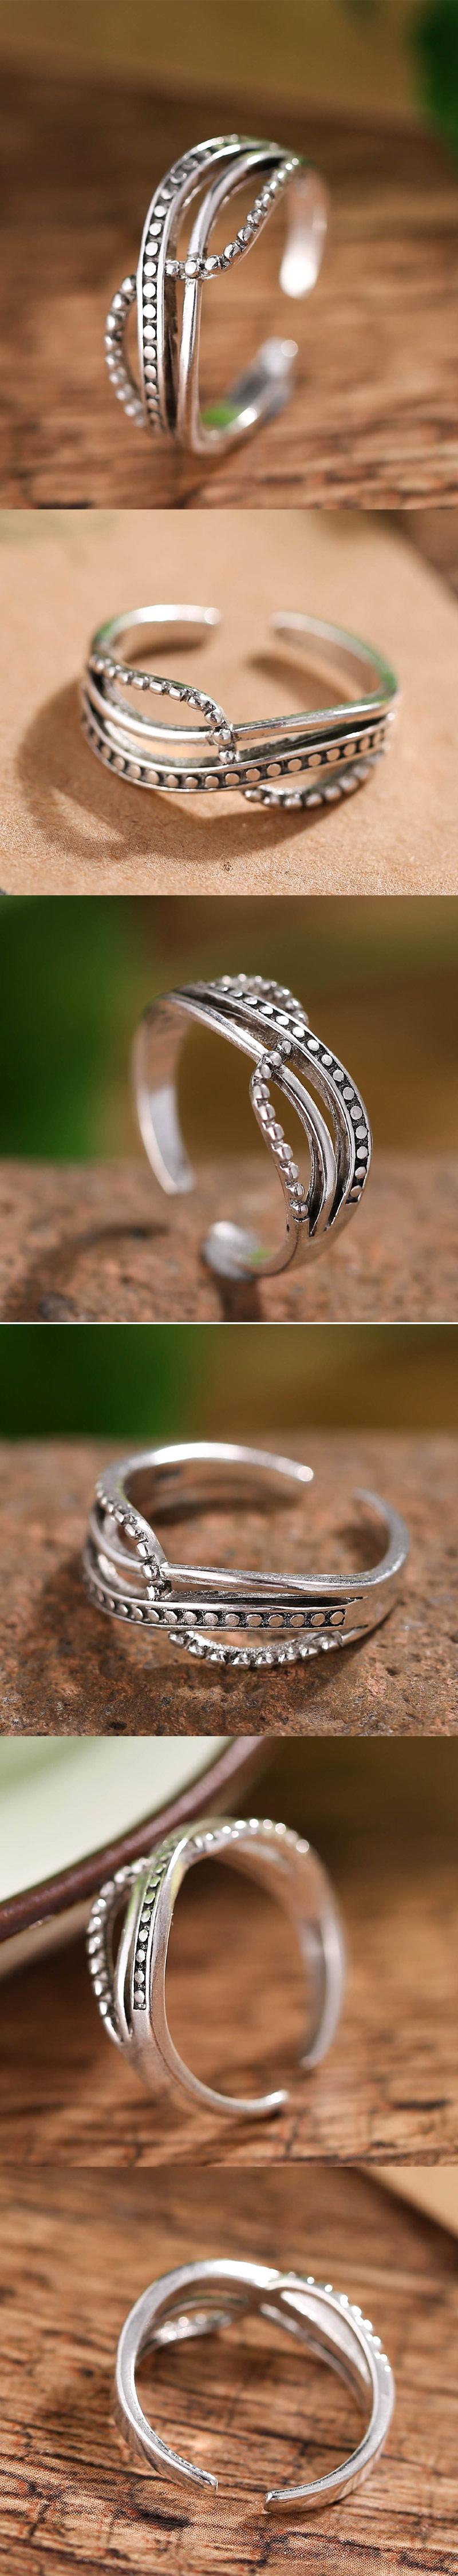 Jewellery Metal vintage split ring wholesales yiwu suppliers china NHSC203736